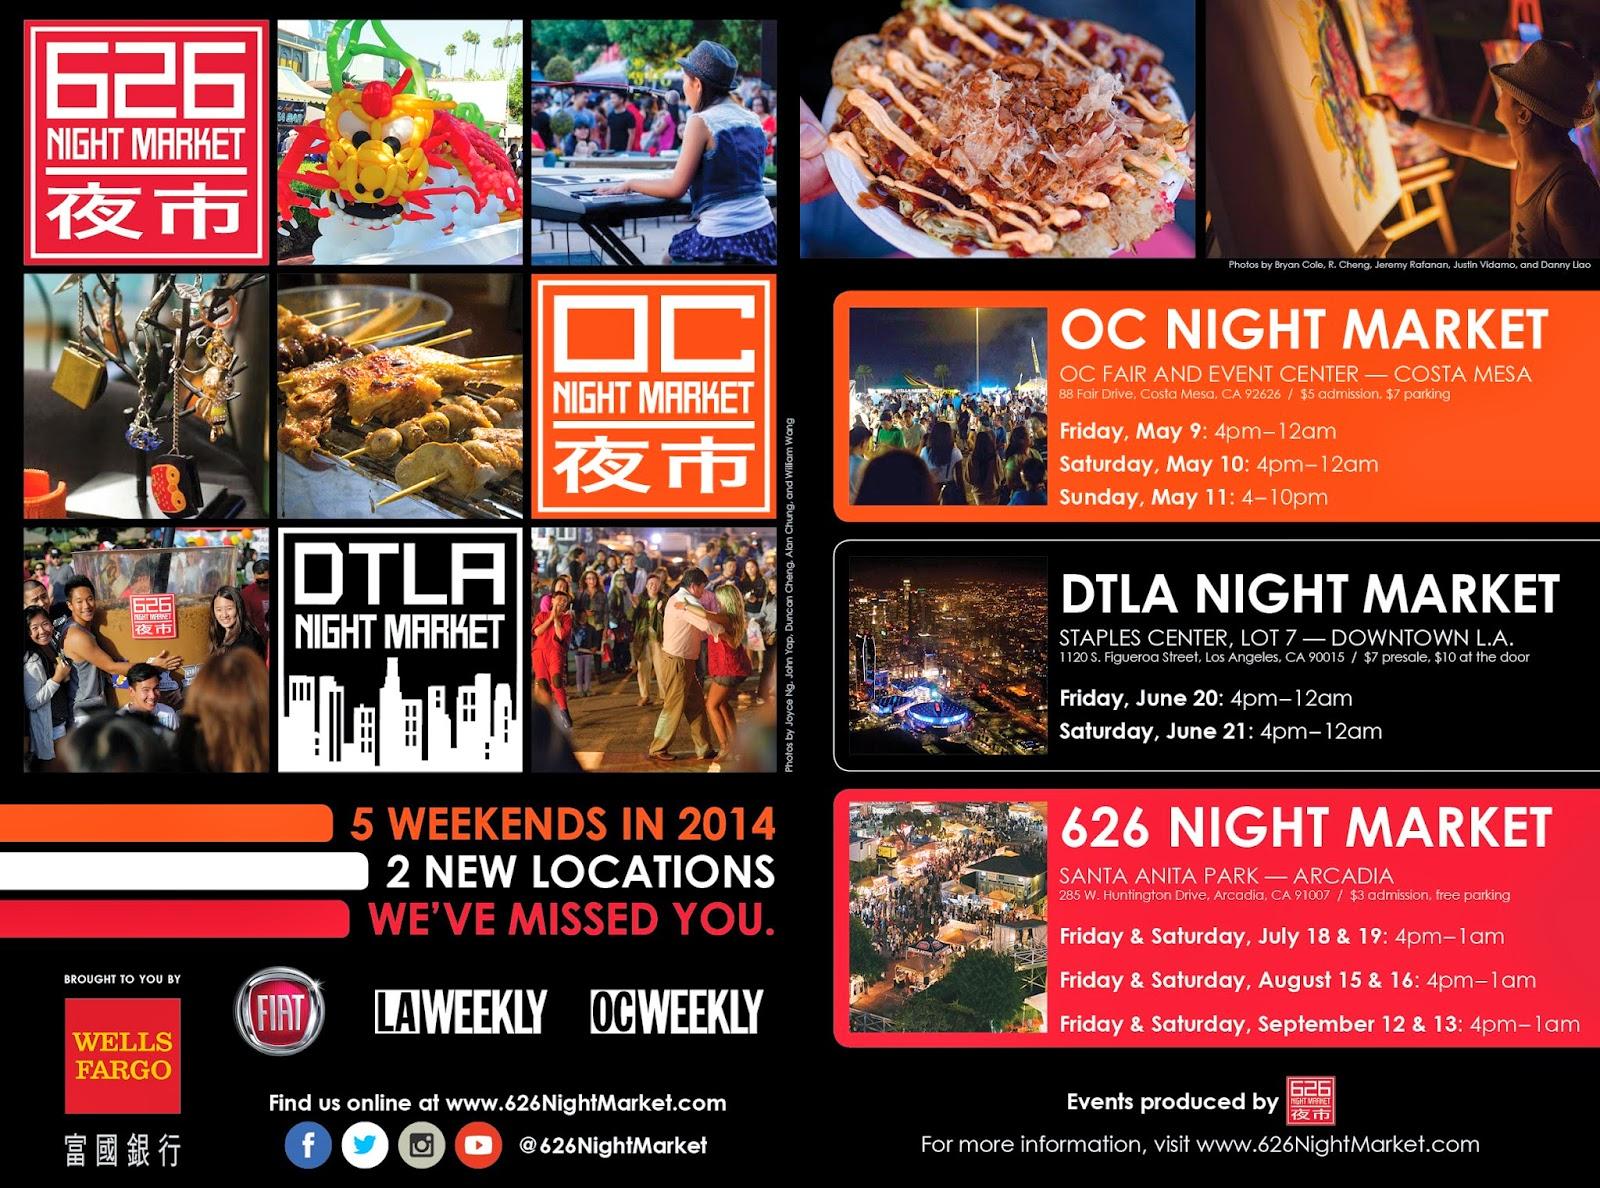 orange county, oc night market, asian food, music, entertainment, events, oc, foodie